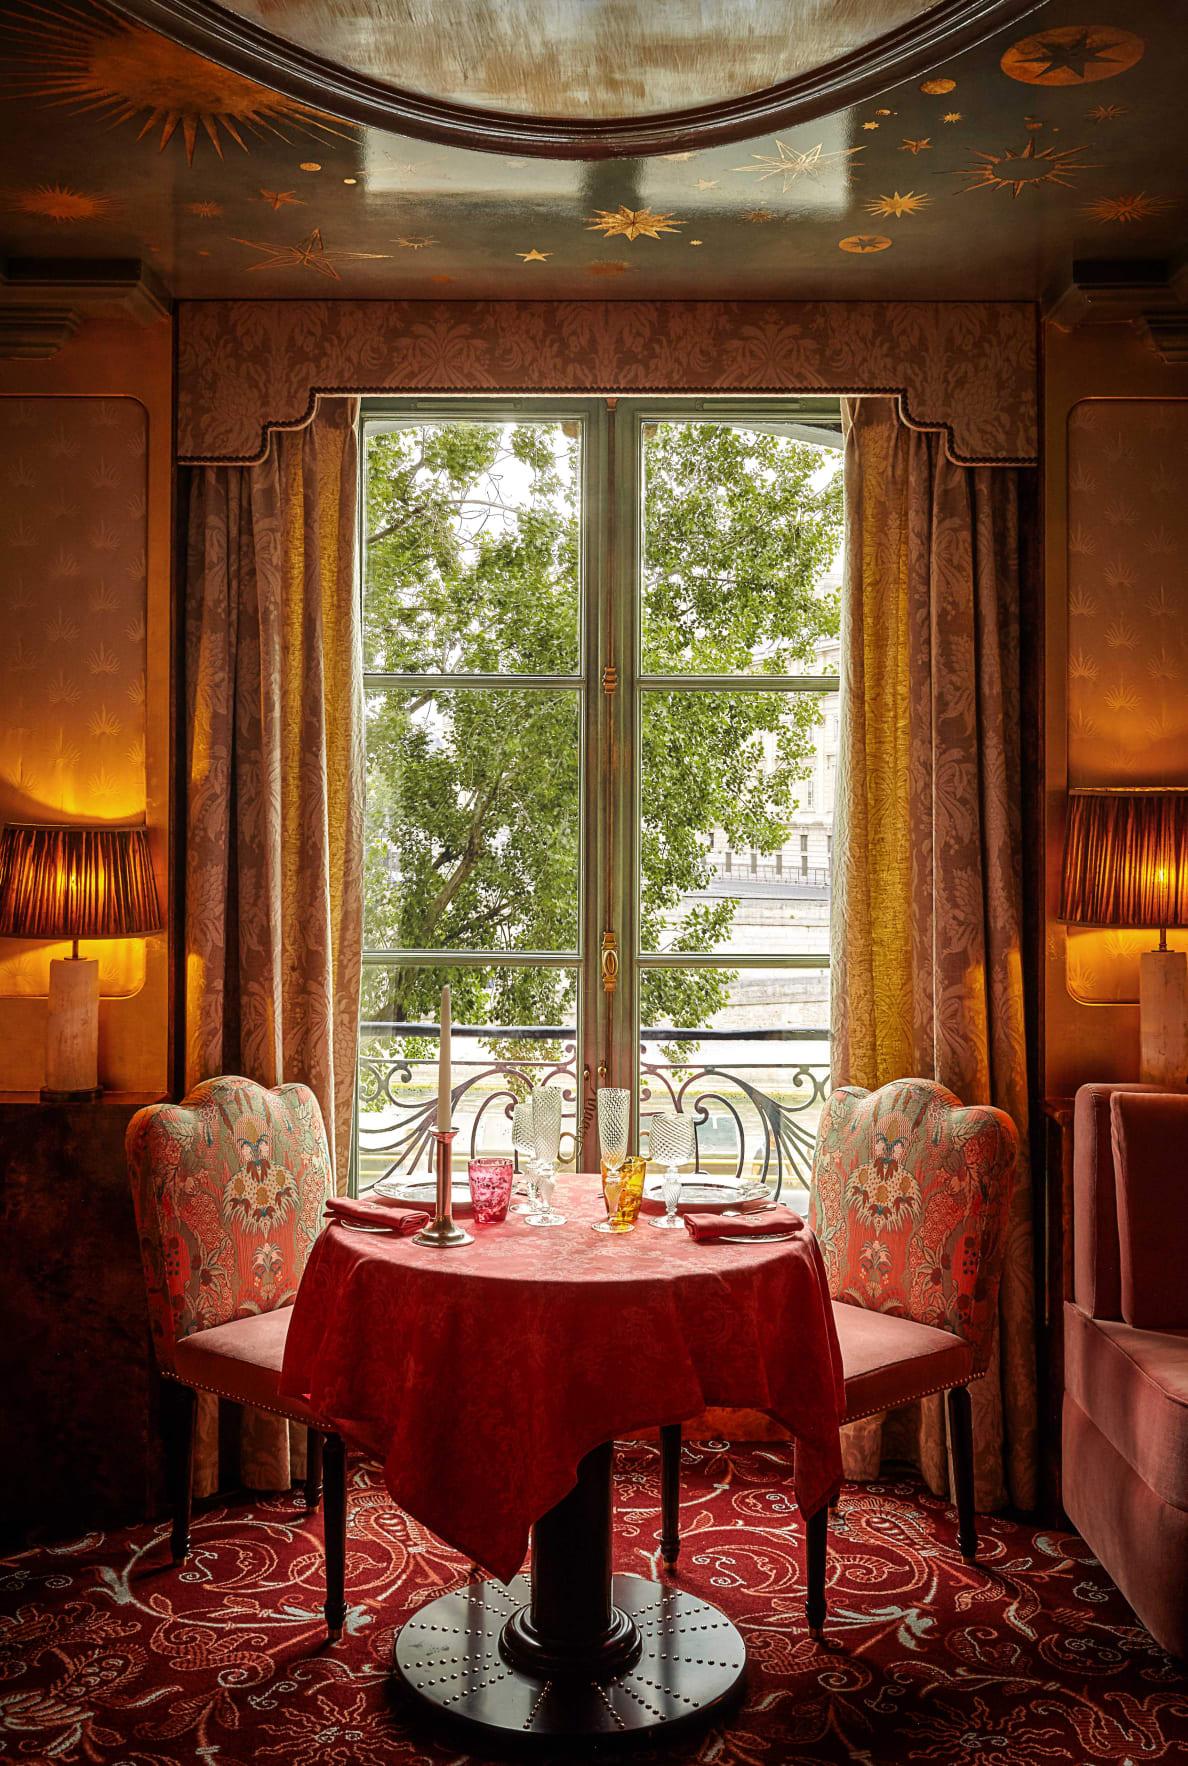 190728-Zaleski-paris-sex-restaurant-embed-7_mubcyi